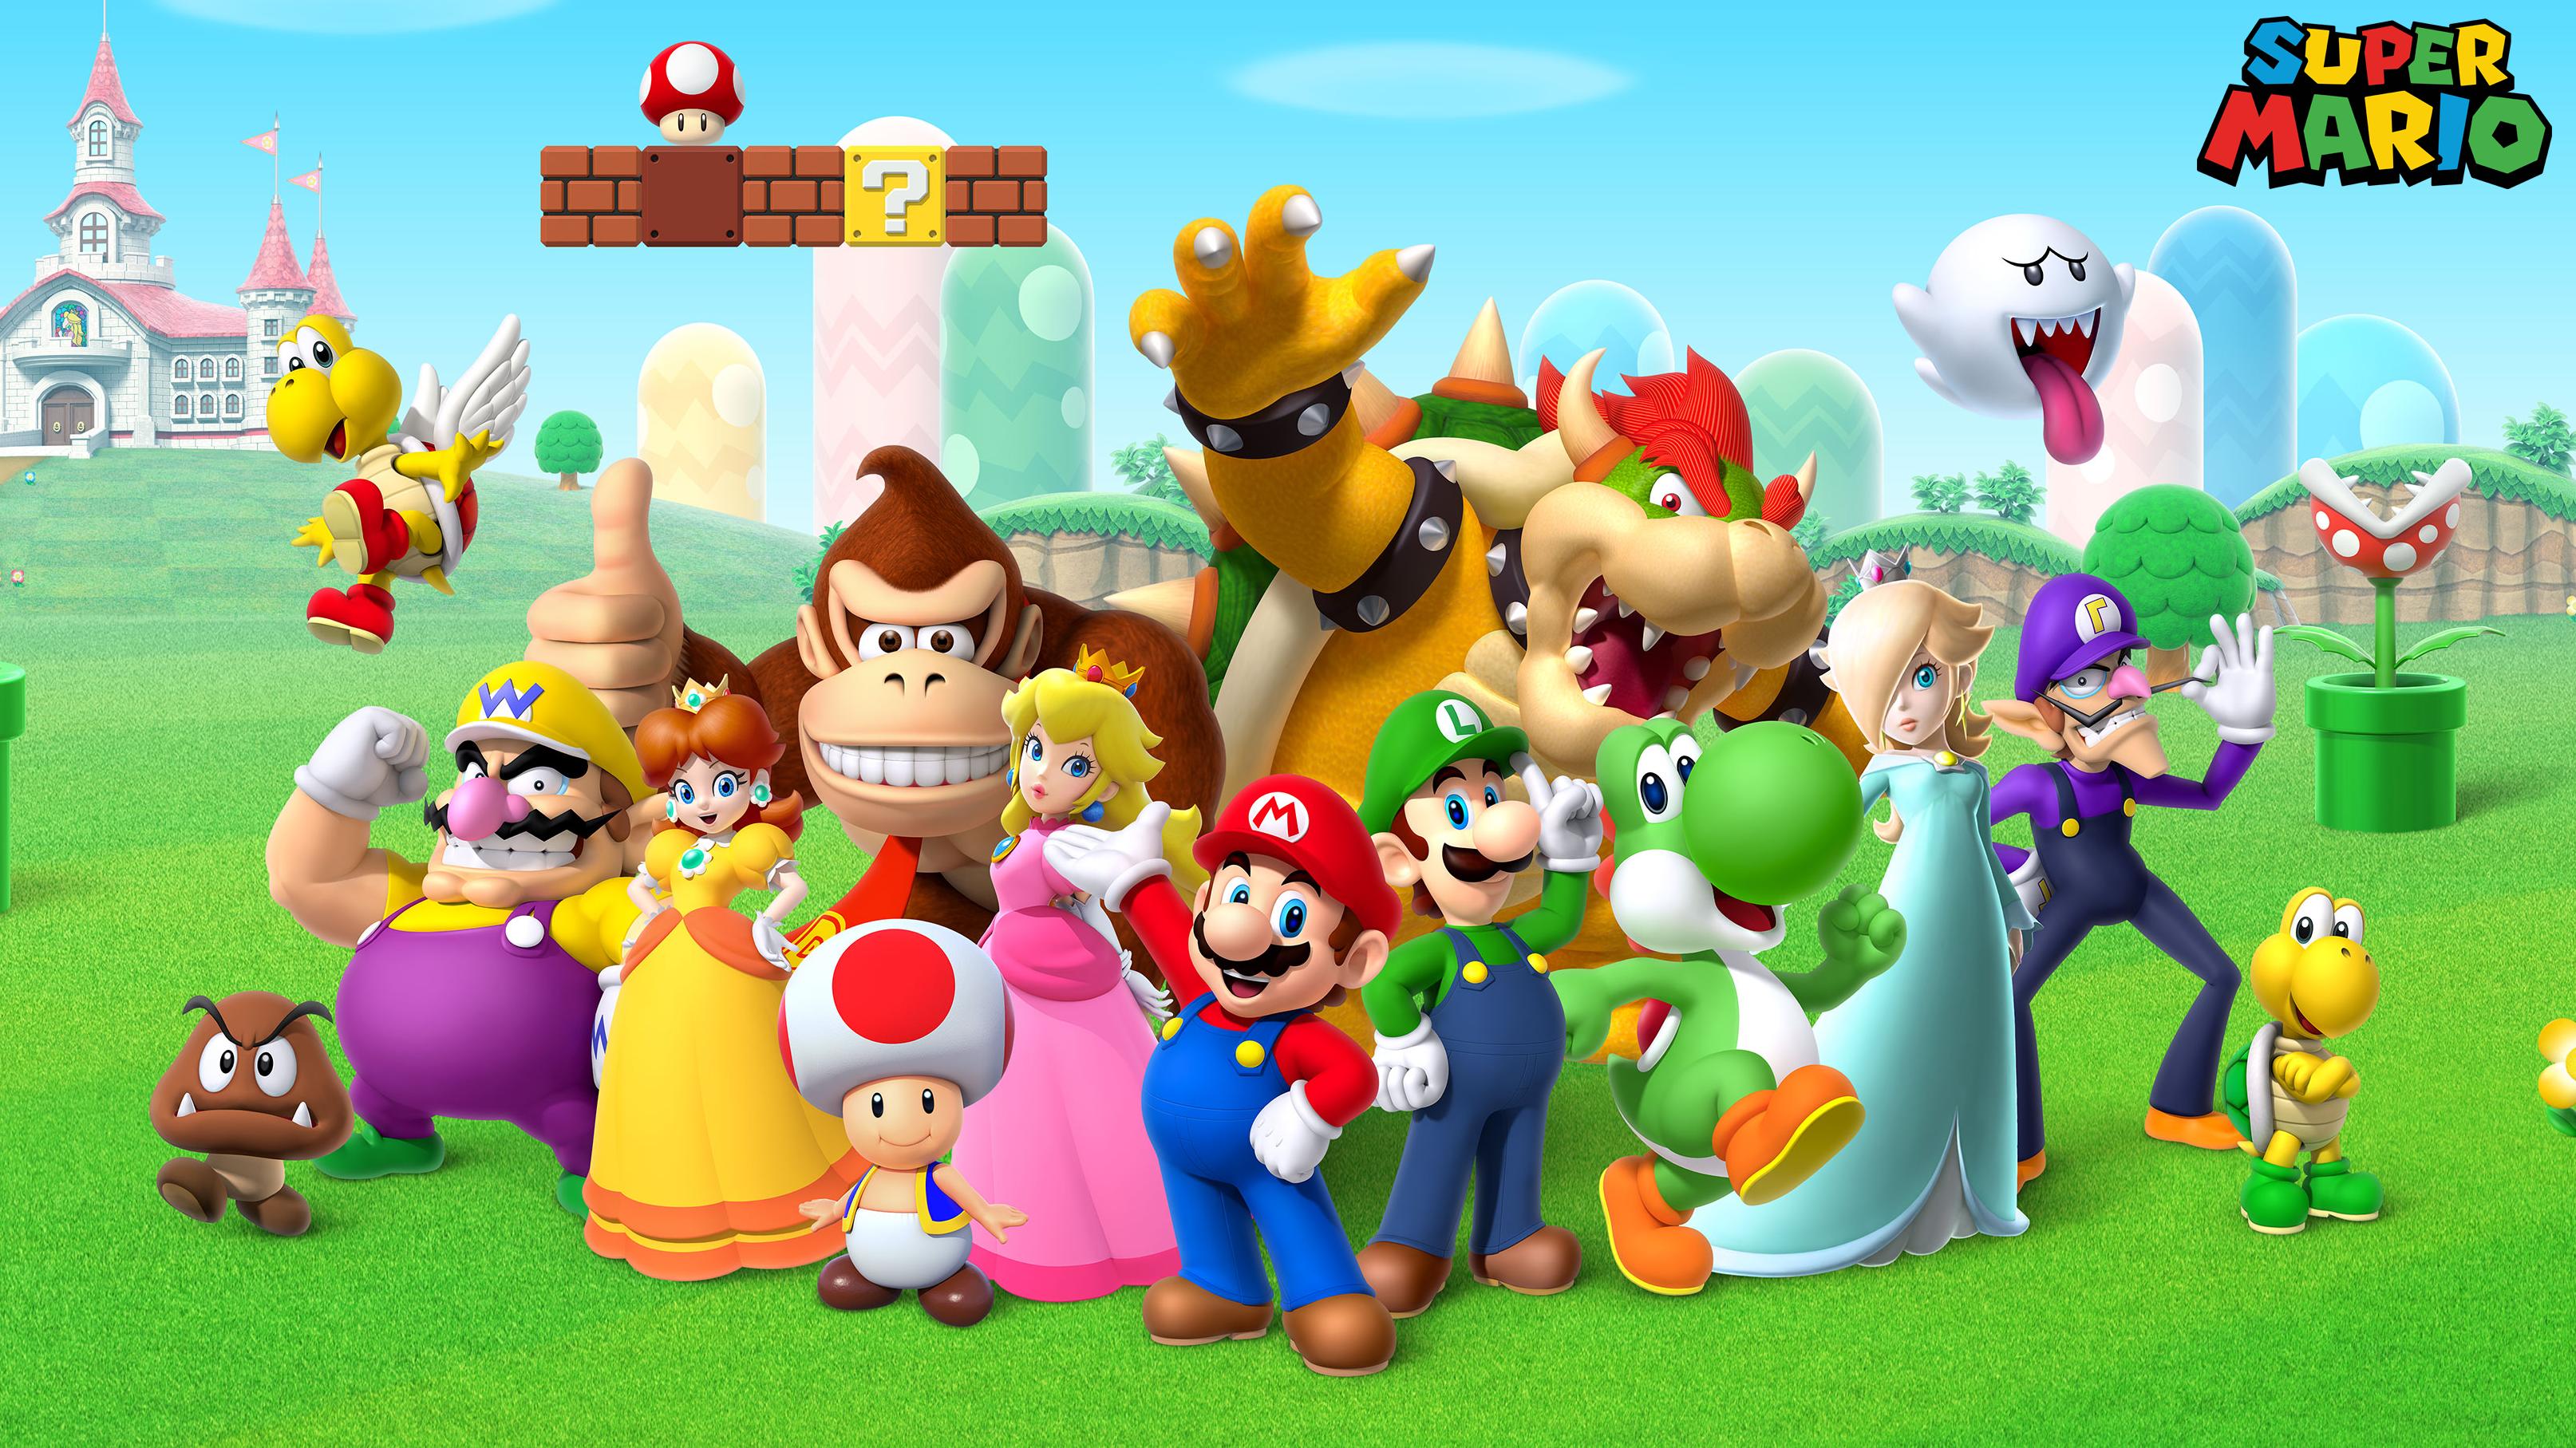 Super Mario Wallpaper Hd Wallpaper Background Image 3228x1815